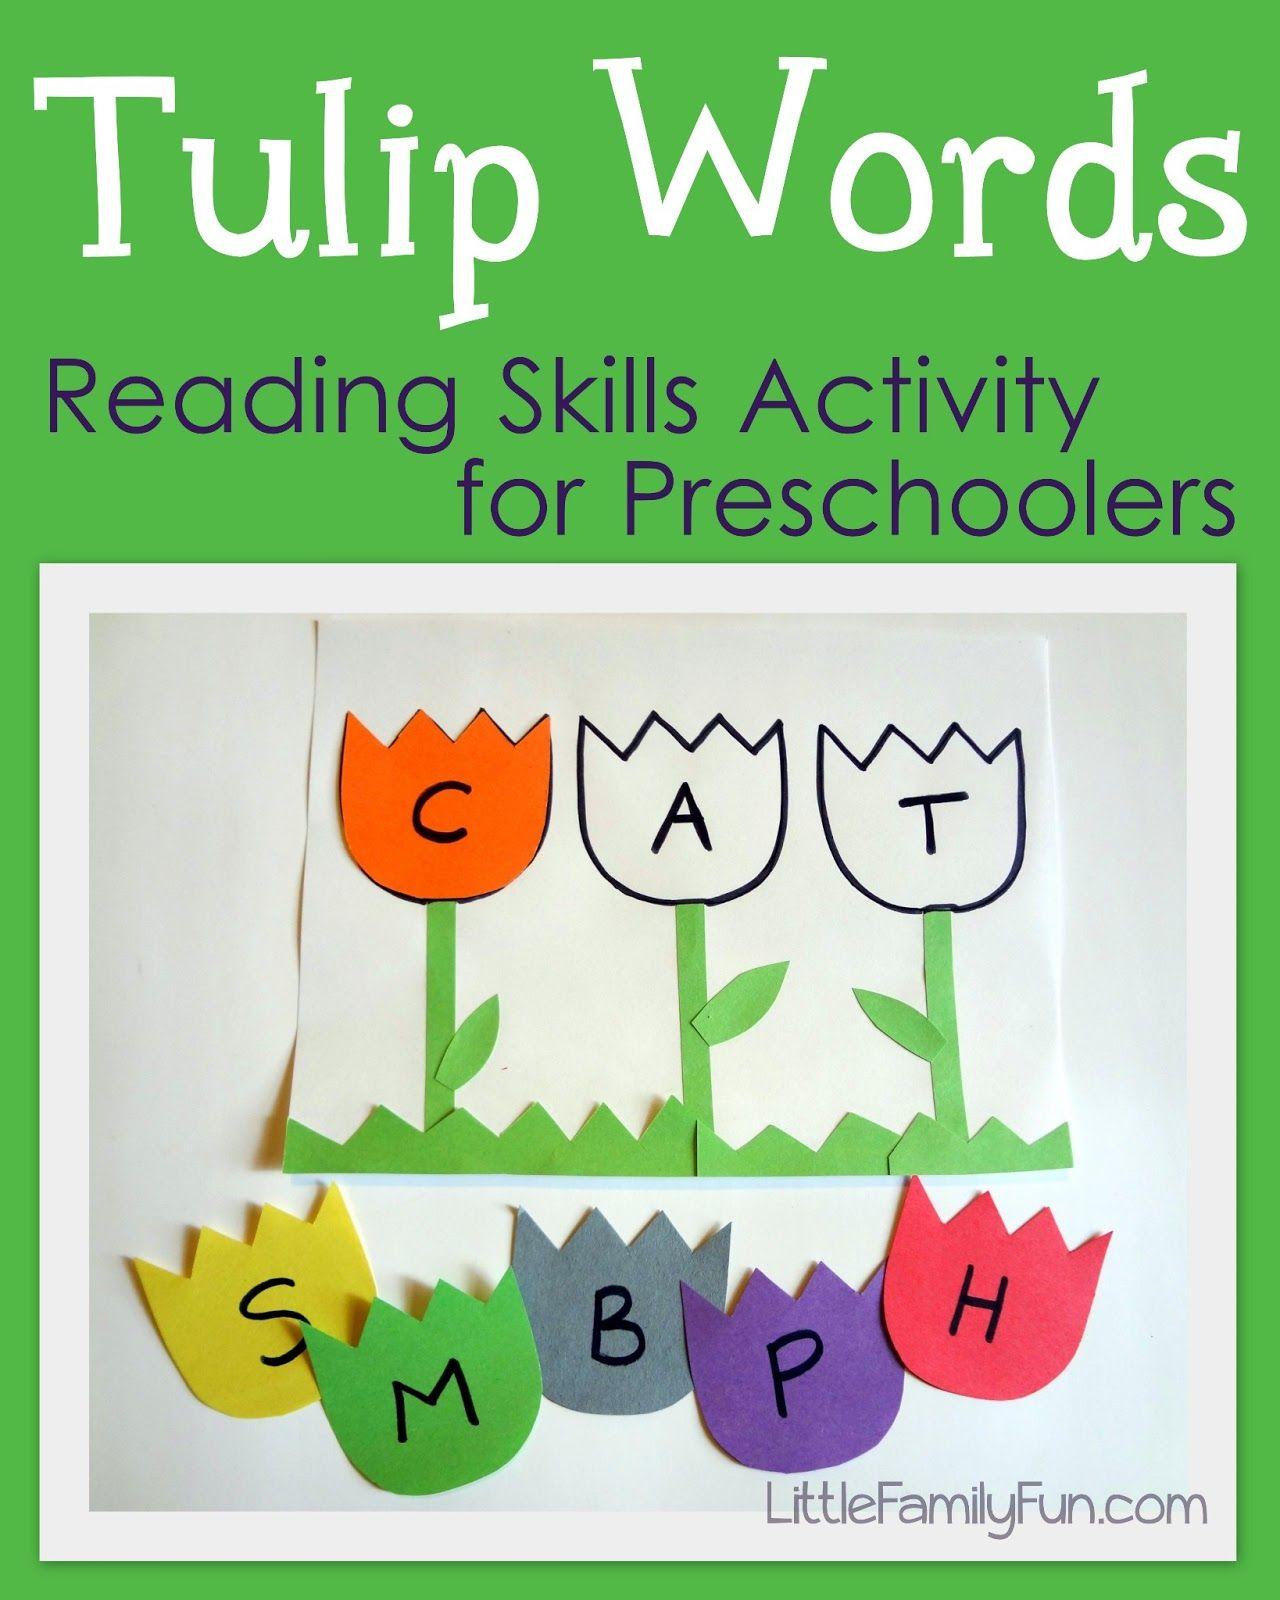 Little Family Fun Tulip Words